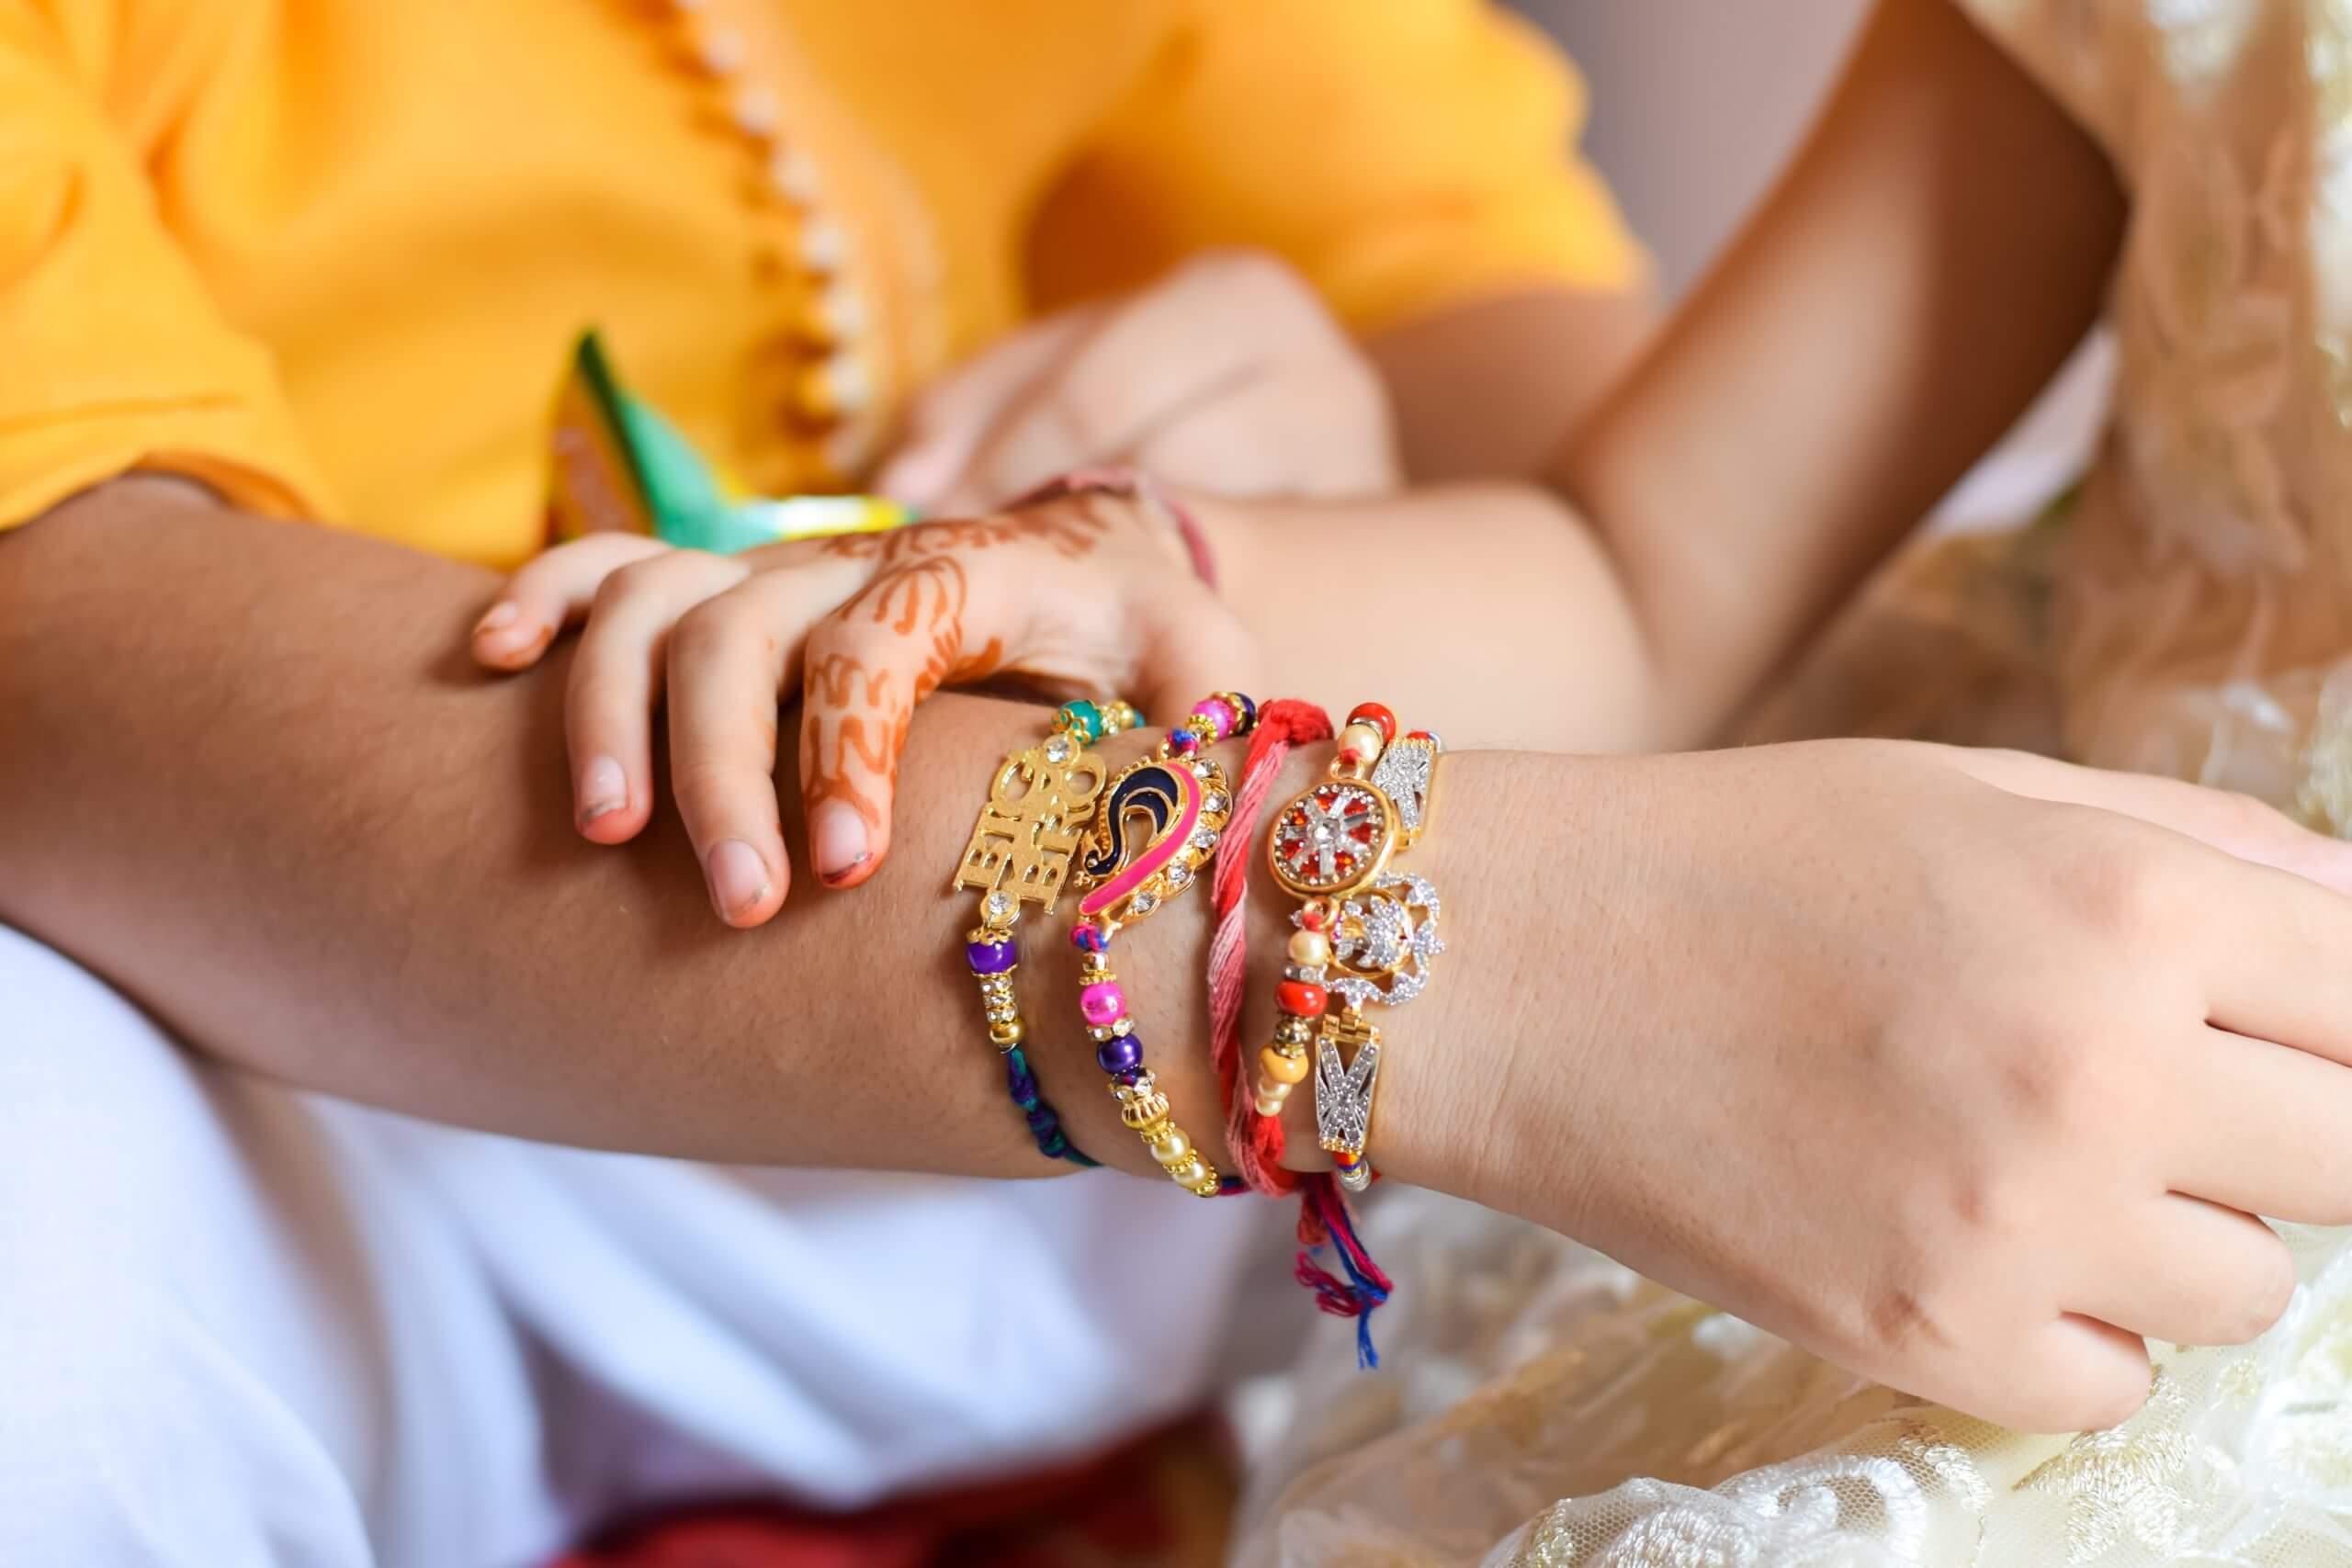 How To Make A 'Vedic Rakhi' In 3 Simple Steps